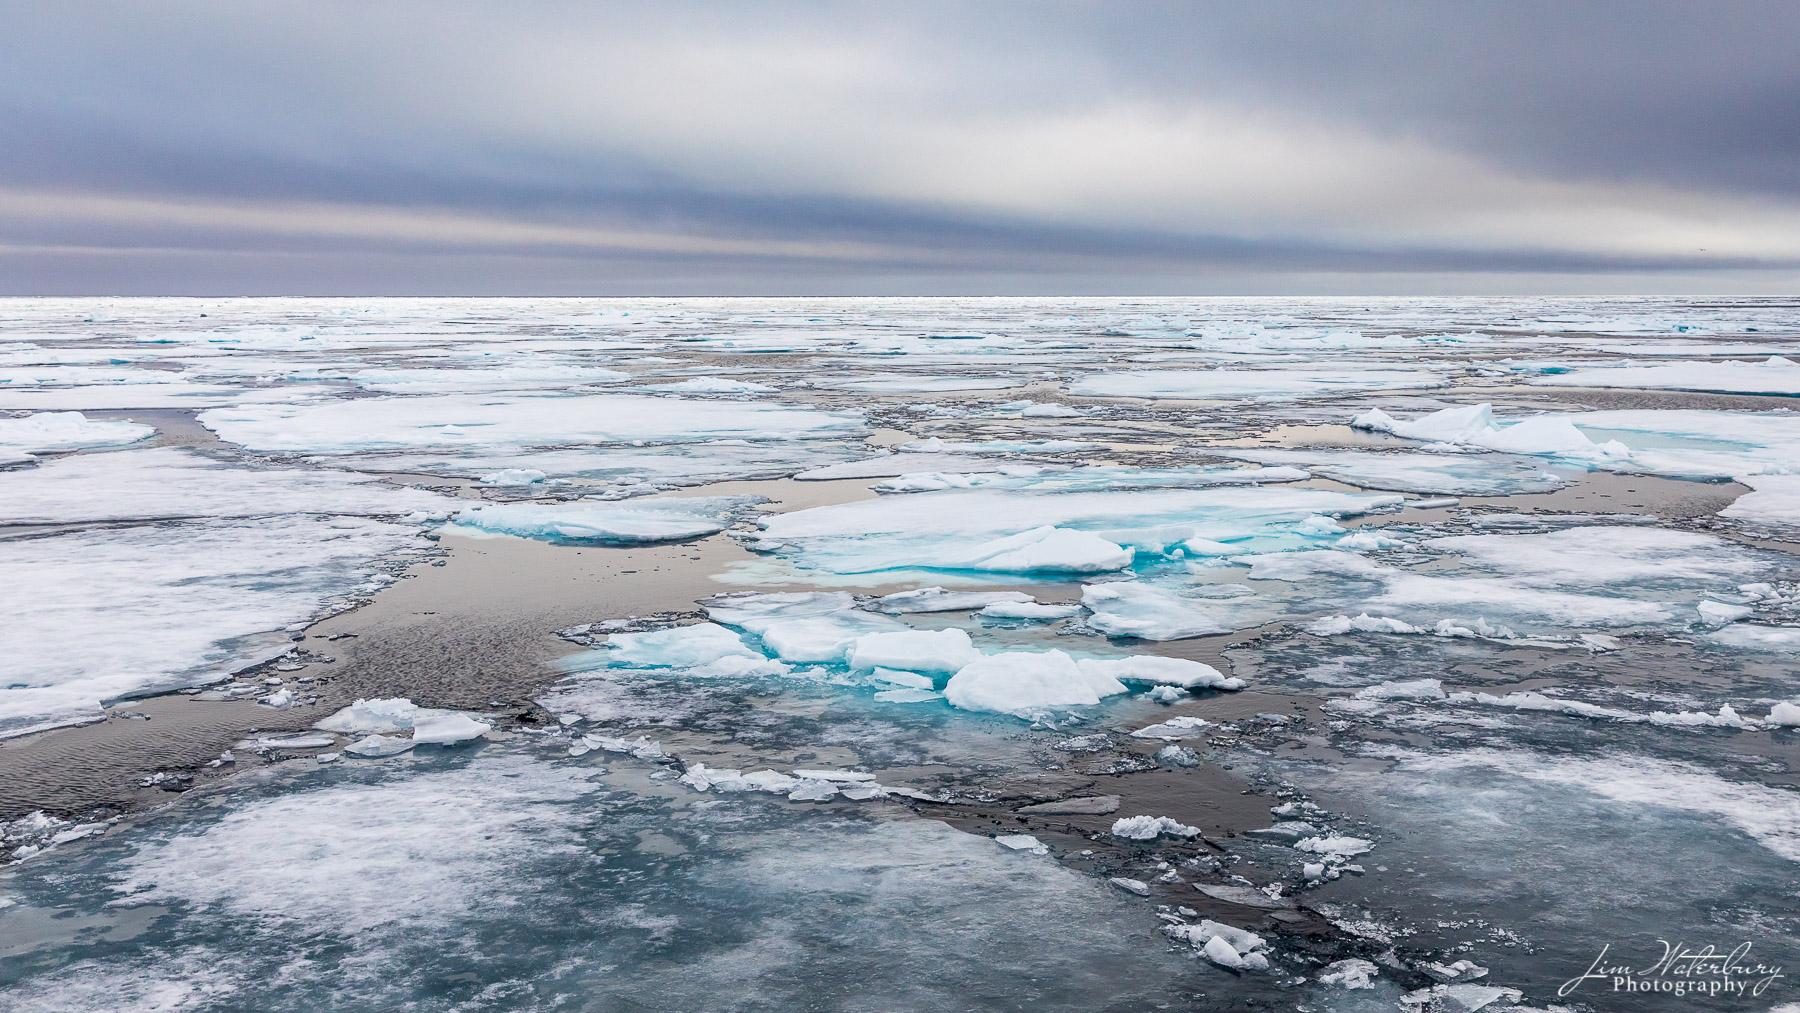 Arctic, Europe, Norway, Svalbard, ice, pack ice, photo